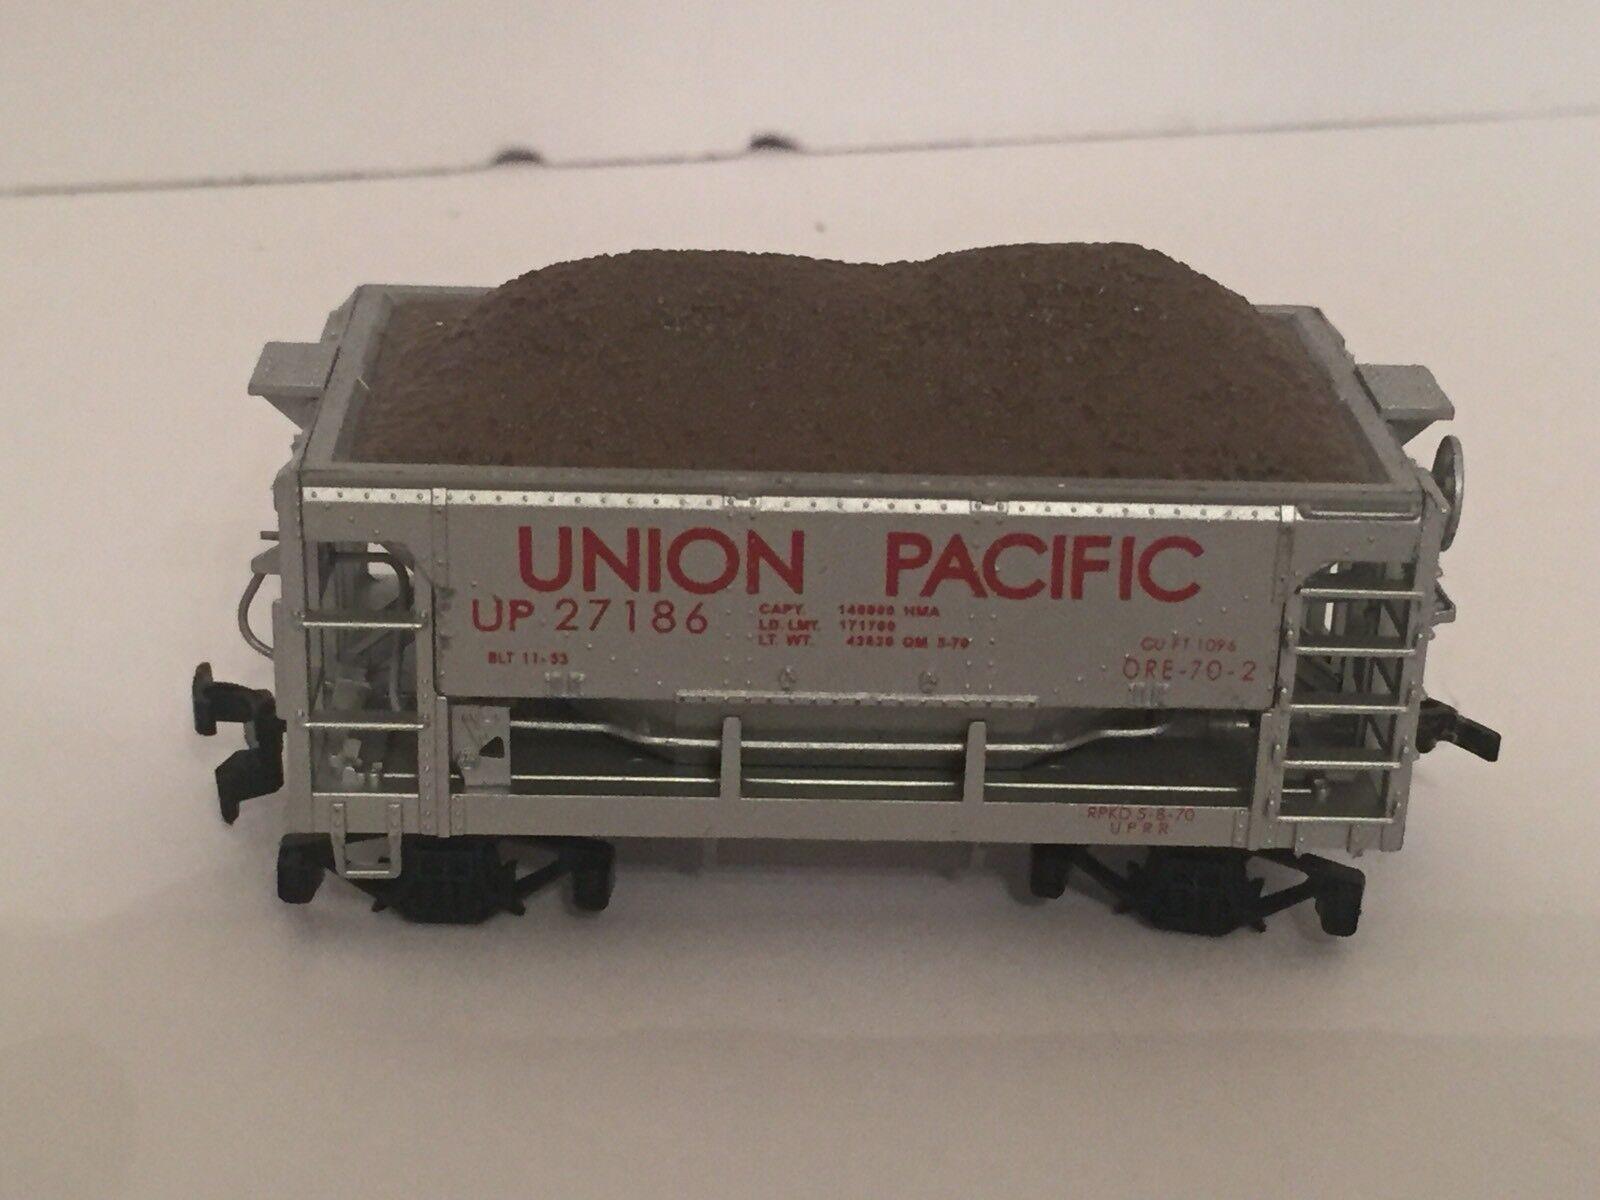 LIONEL TRAIN DIE CAST UP 27186 UNION PACIFIC RAILROAD ORE HOPPER CAR -RARE-